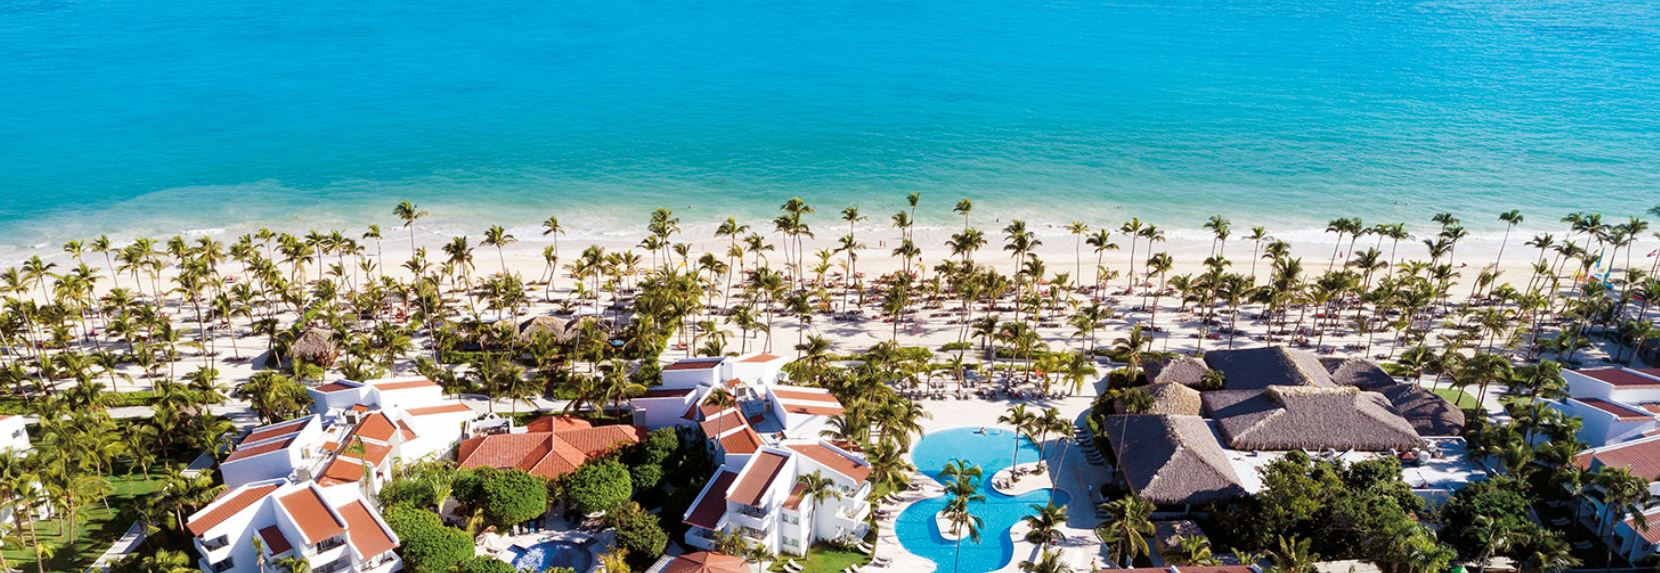 Viaje a Punta Cana fin de año Hotel Occidental Punta Cana